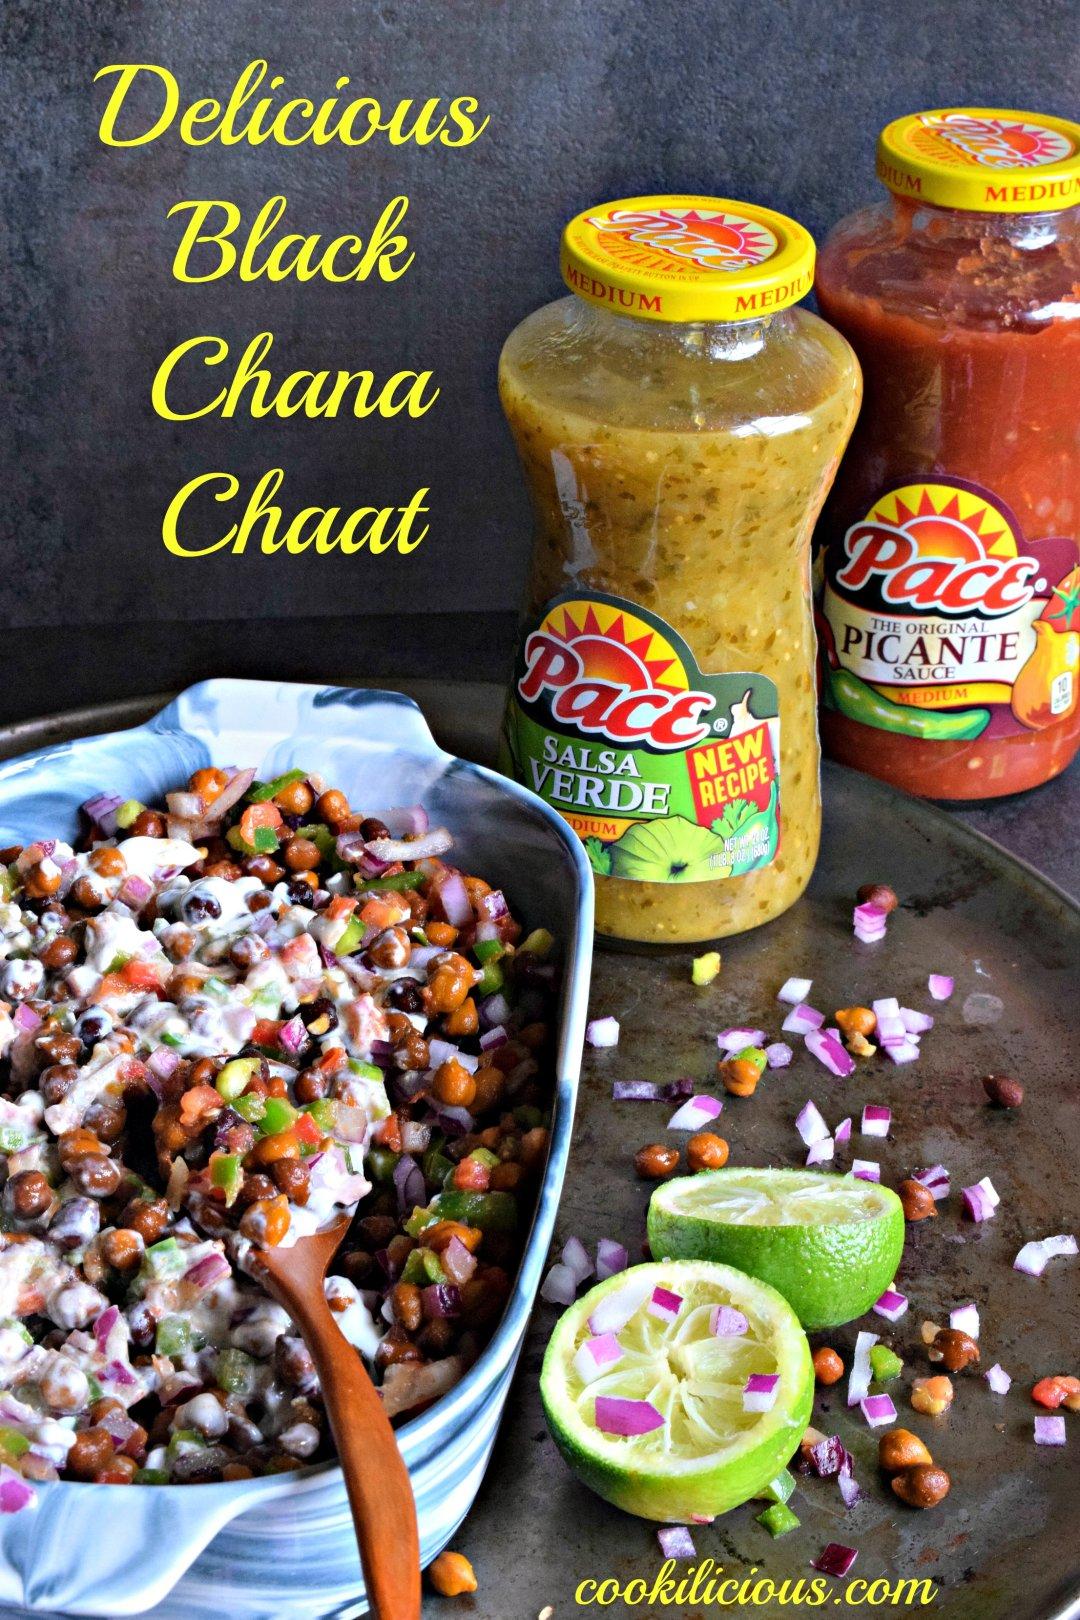 Black Chana Chaat - Indian Street FoodAppetizers & Snacks